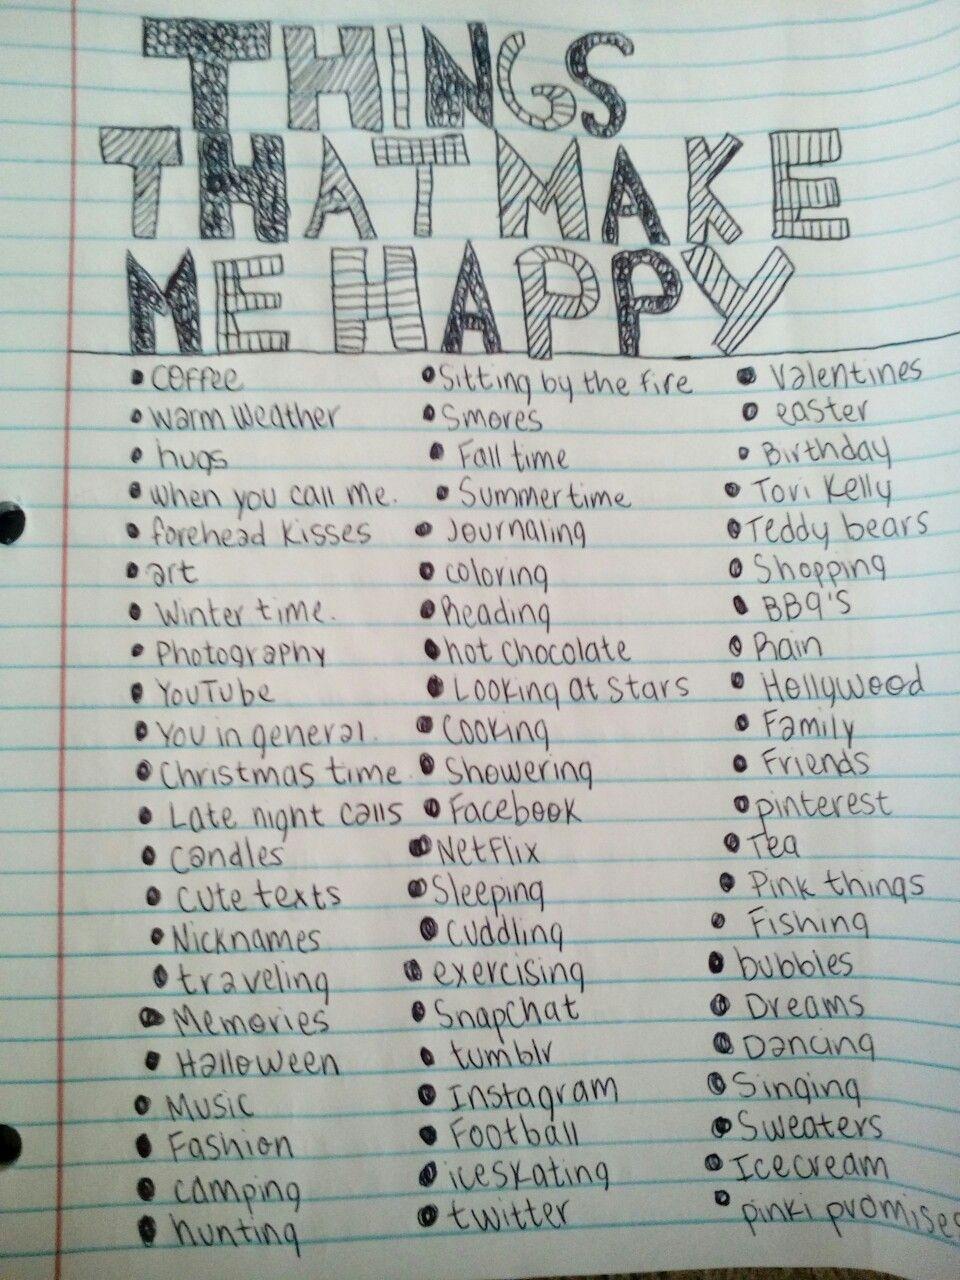 Things that make me happy. | Things that make me happy ...